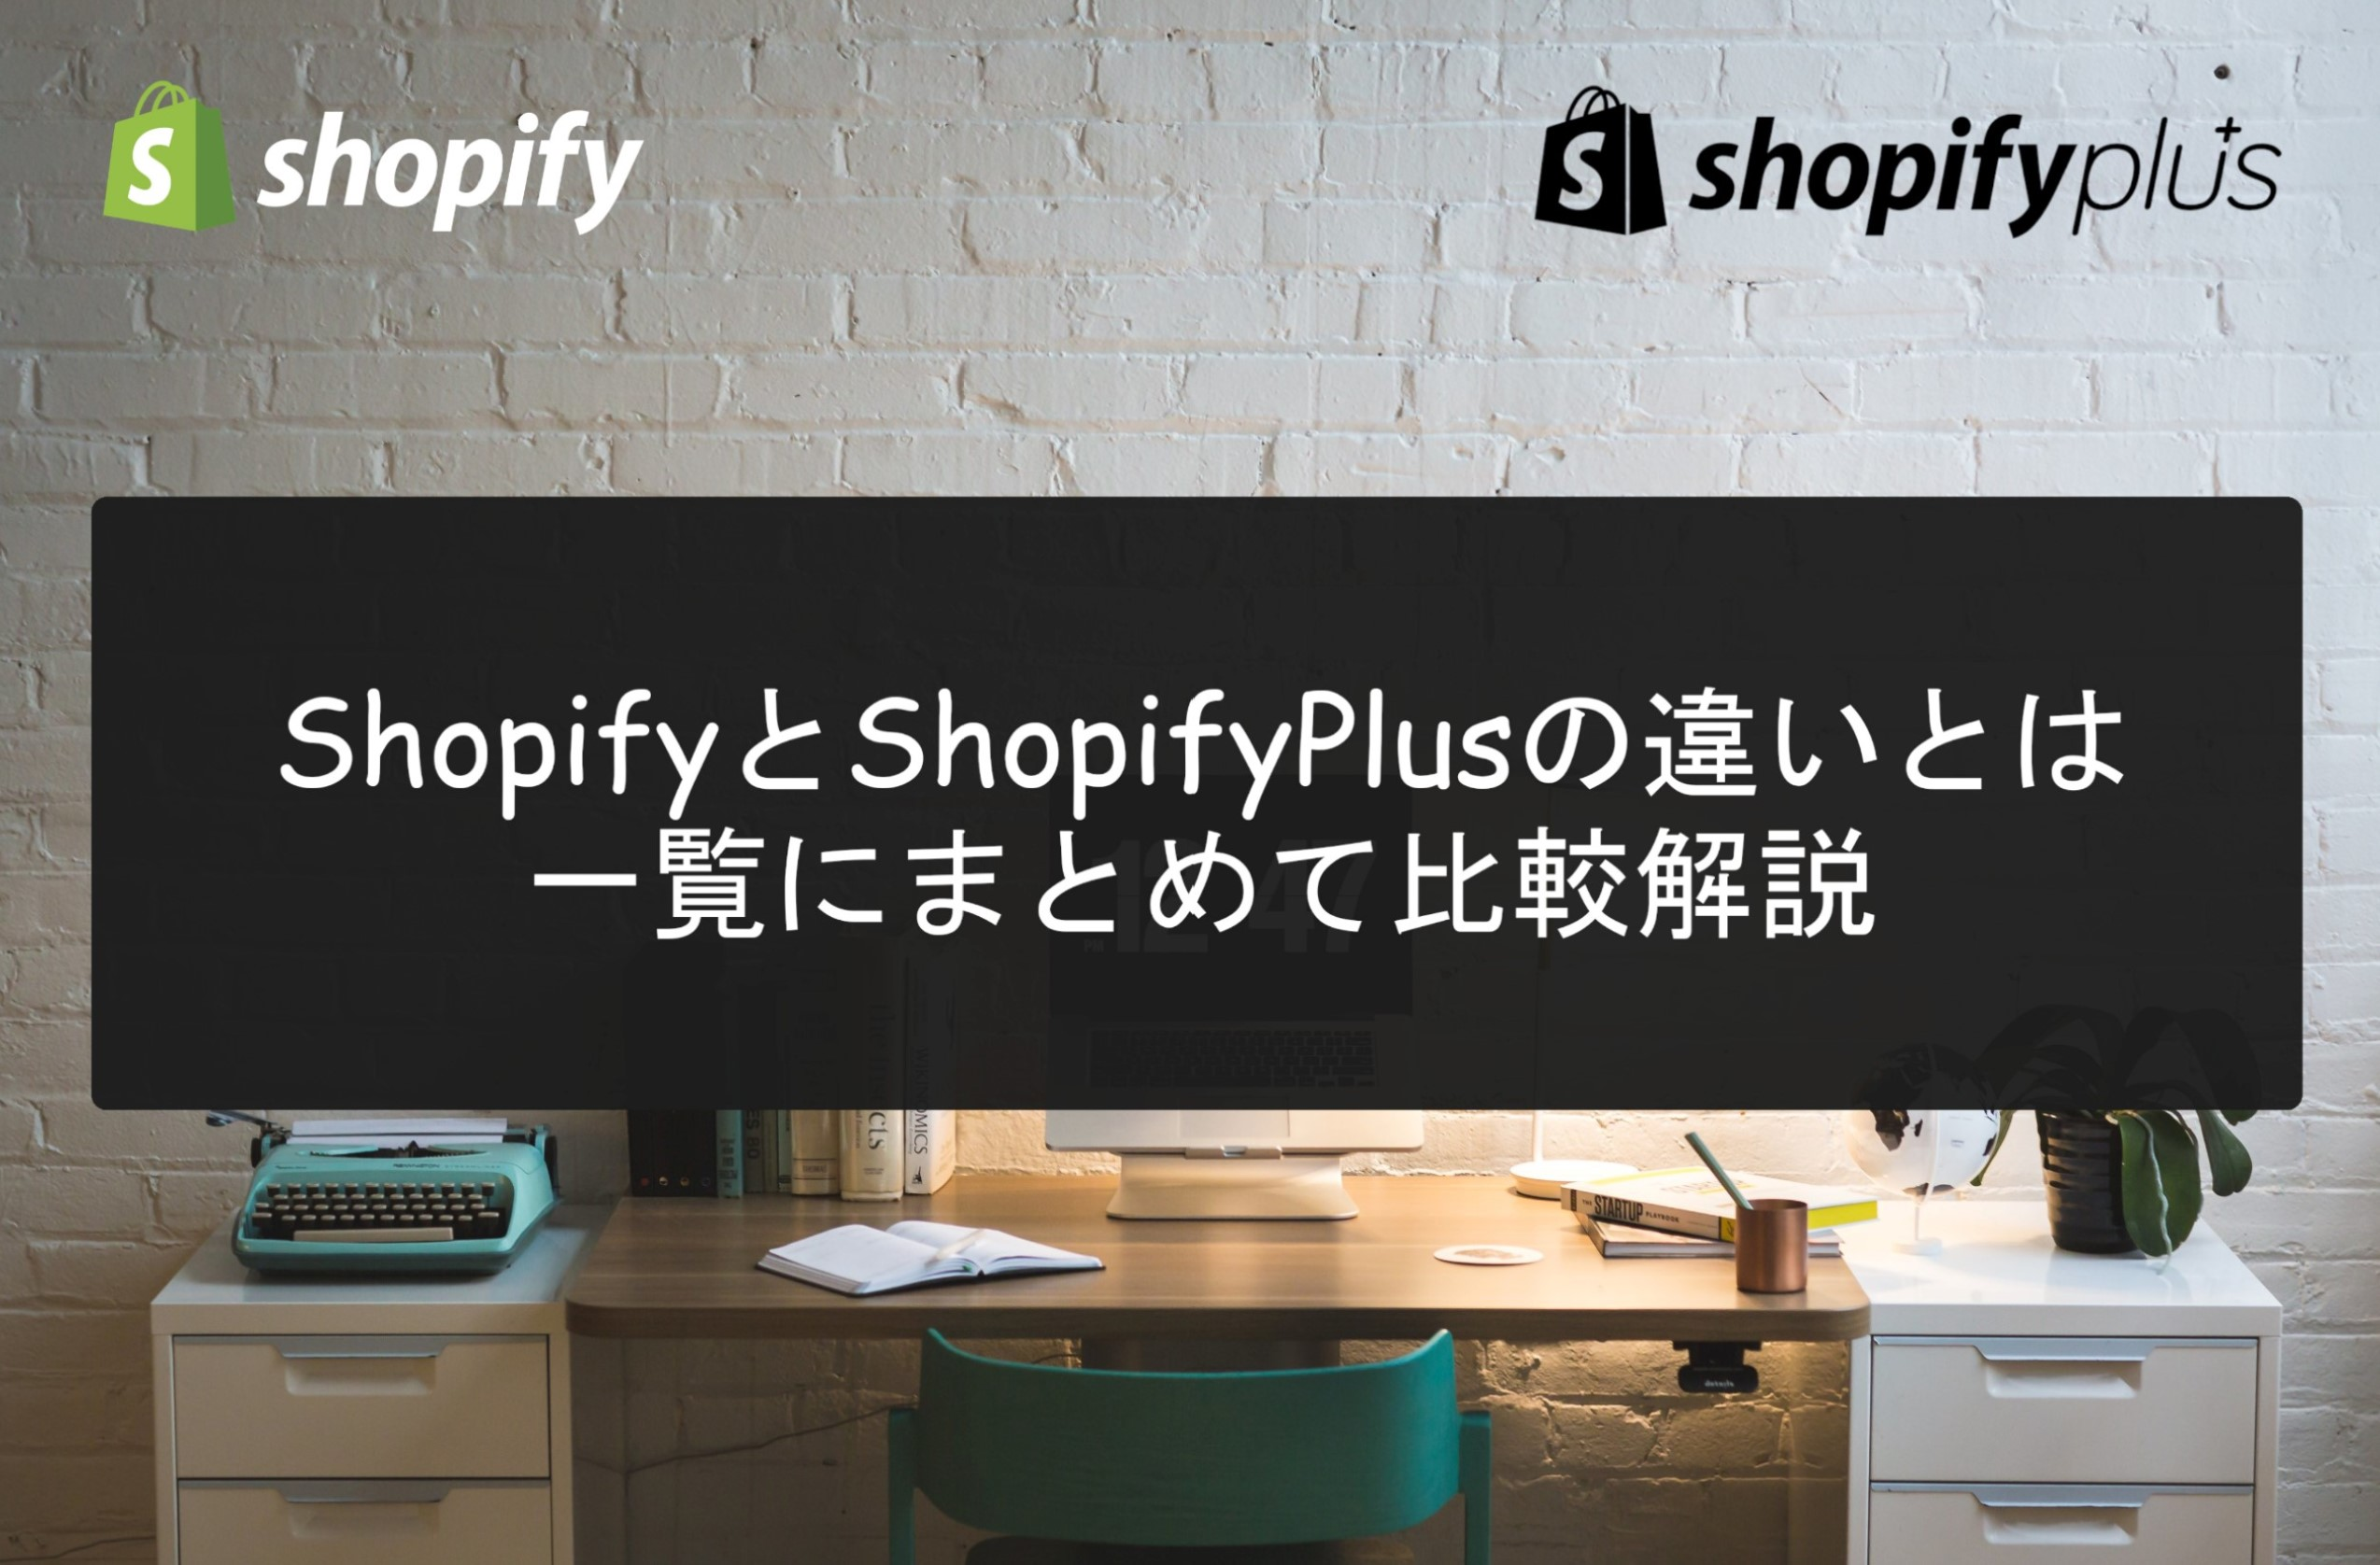 Shopify Plus(ショッピファイプラス)とは?Shopify通常プランとShopify Plusの機能の違いを解説